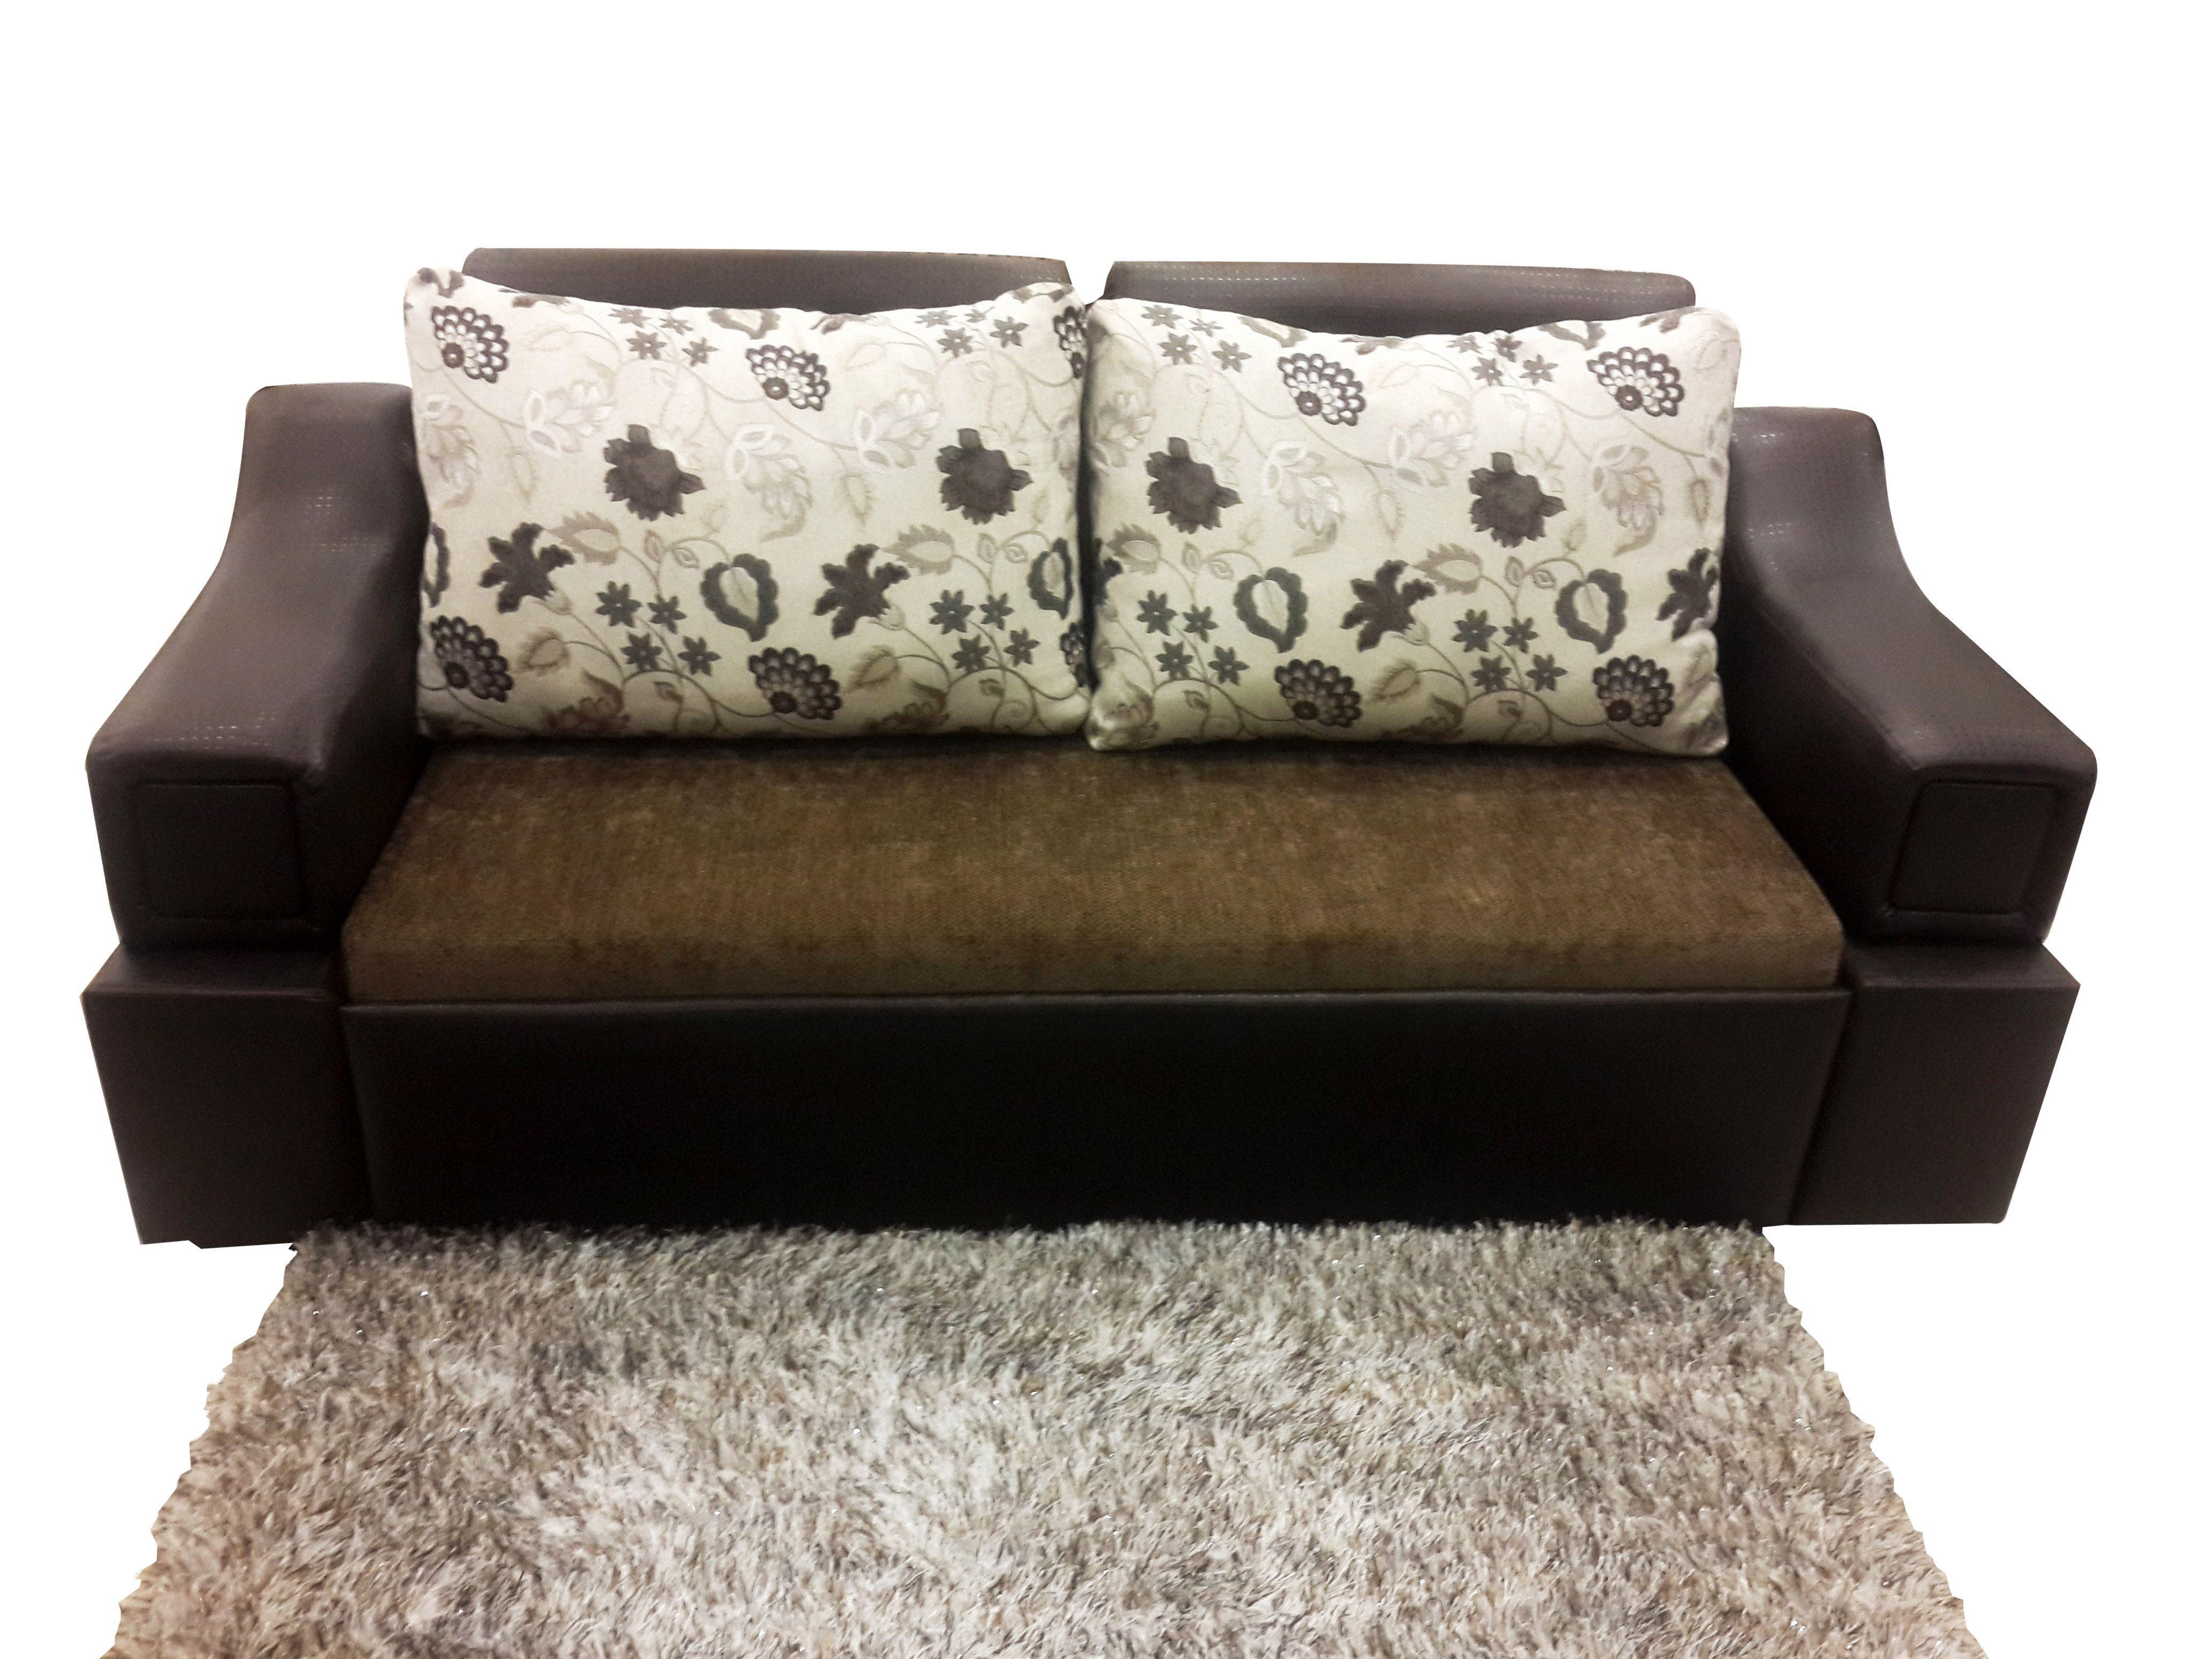 OSCB11 Crystal Sofa Bed Bed design, Sofa, Bed